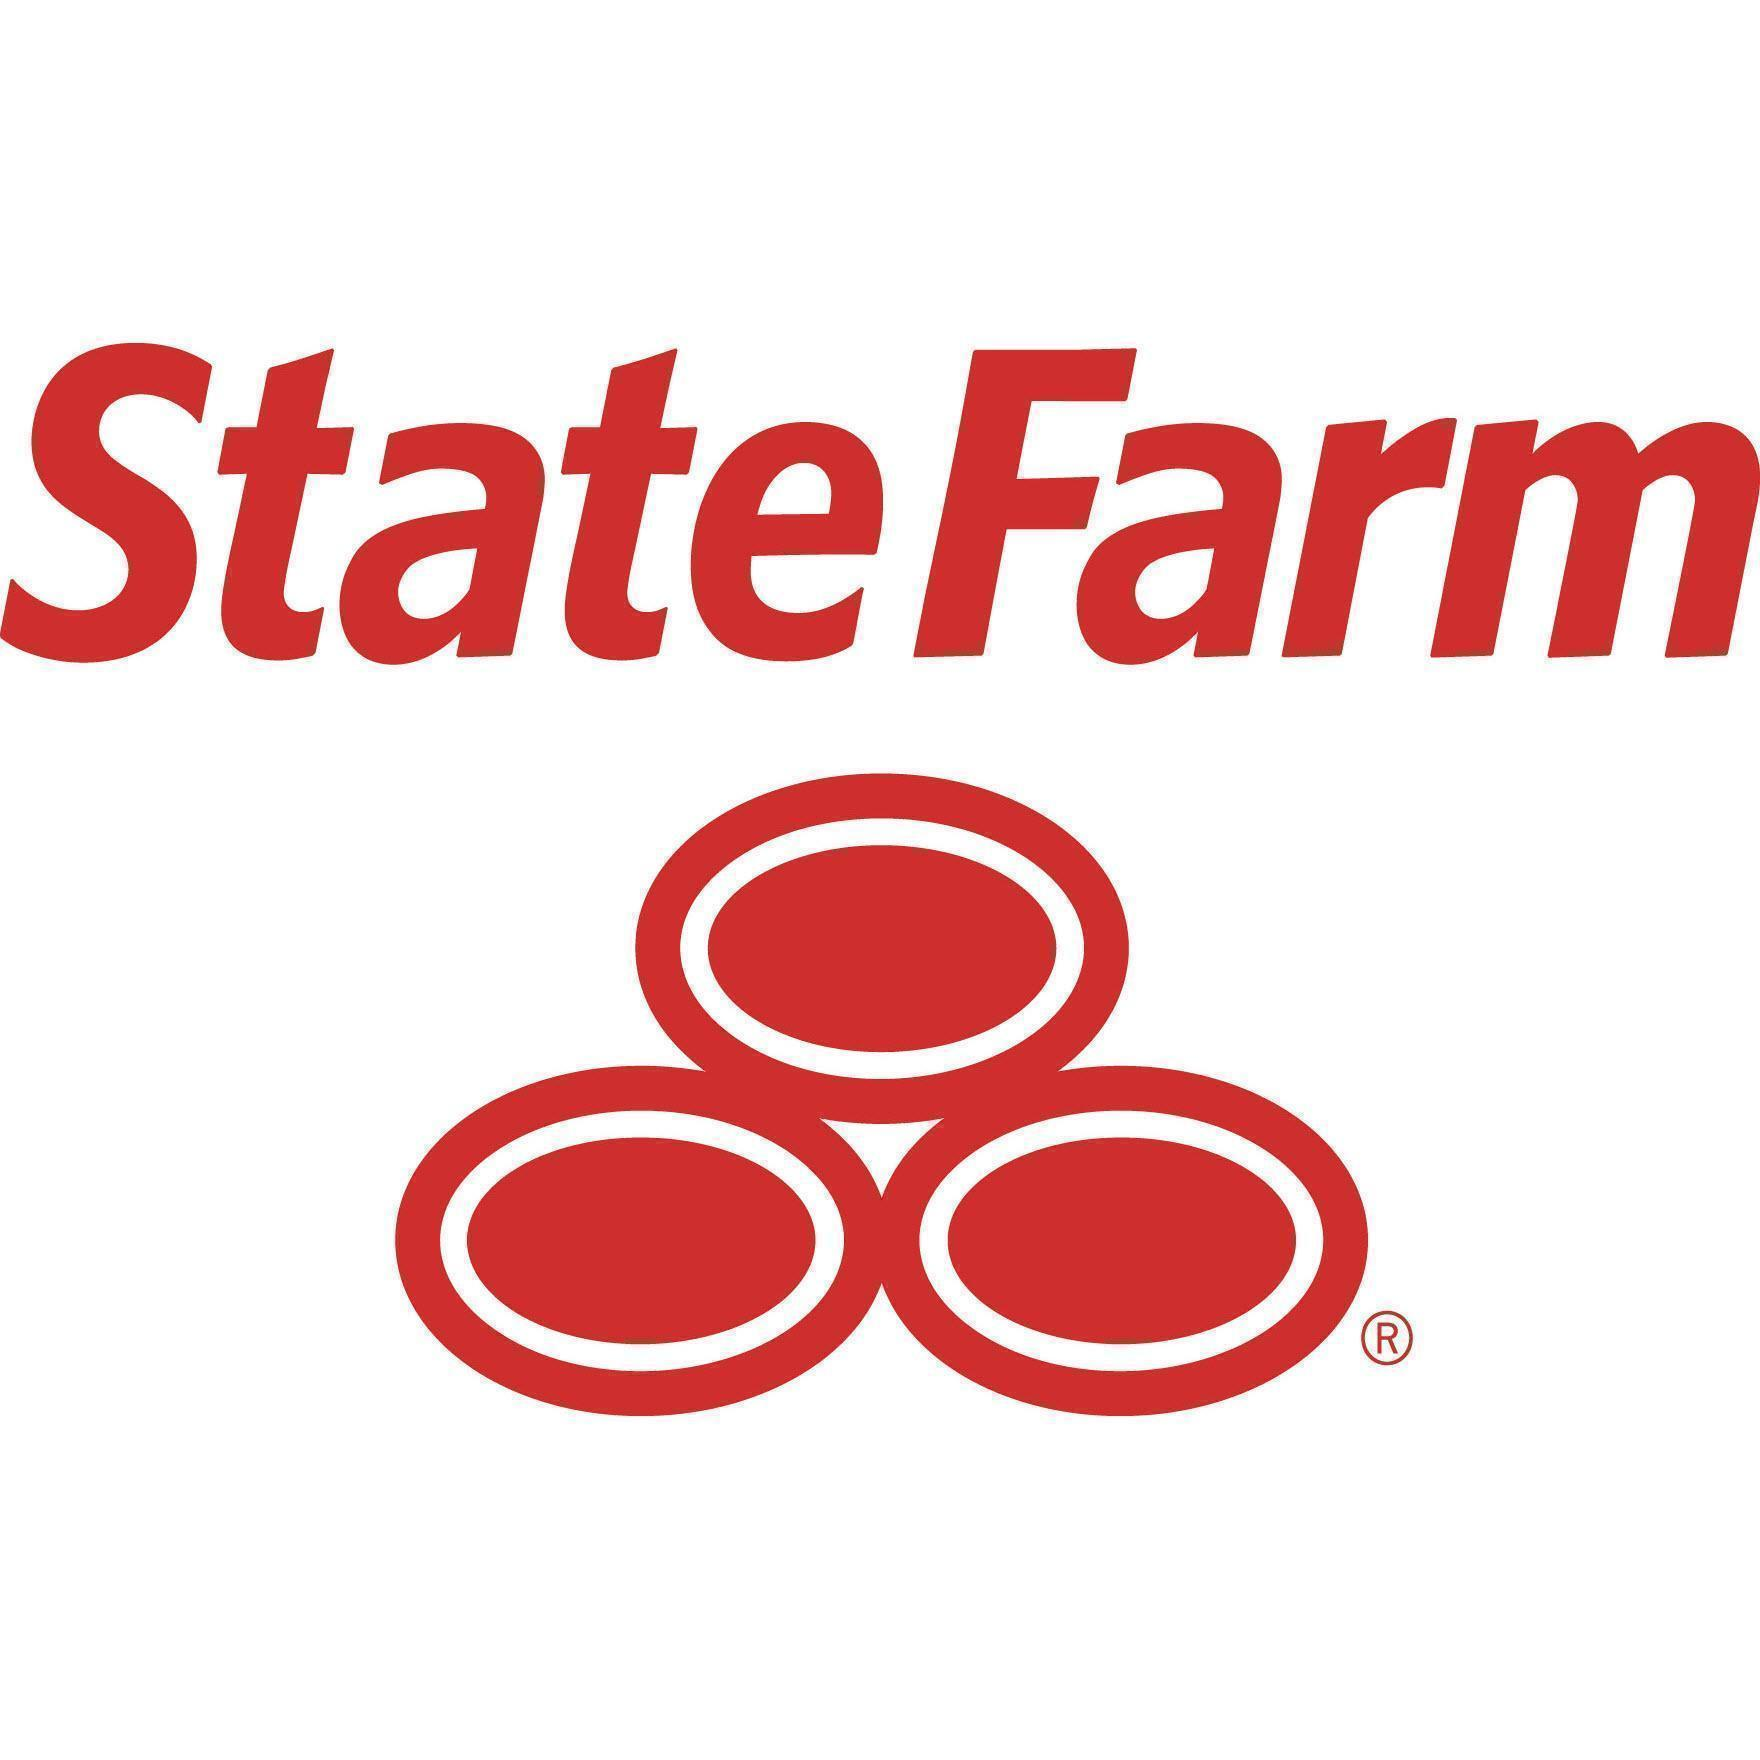 Karl E Wright - State Farm Insurance Agent